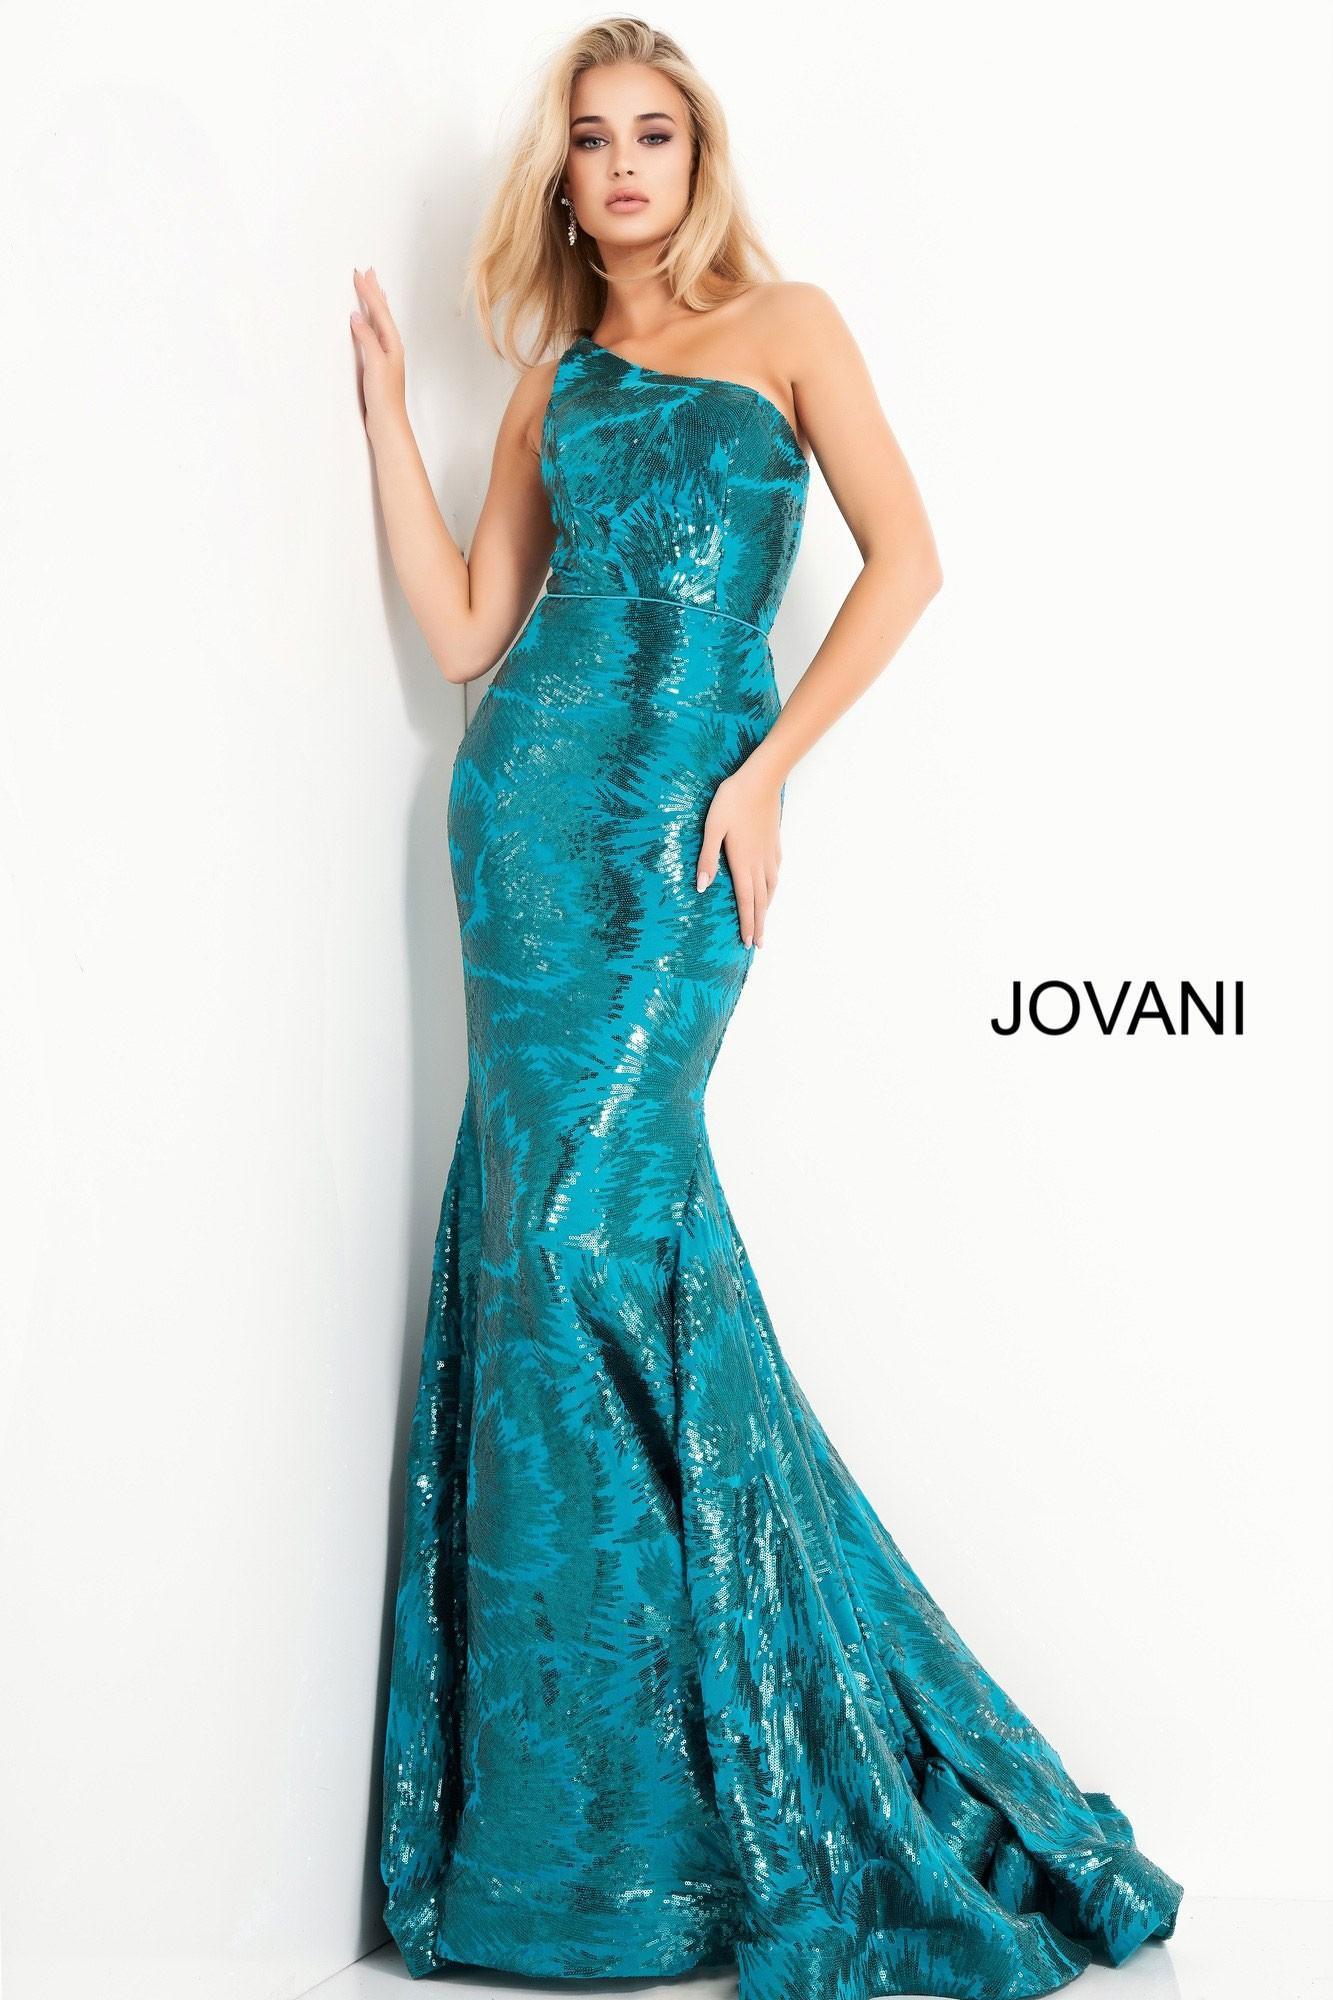 Jovani 1845 Sleek One Shoulder Gown